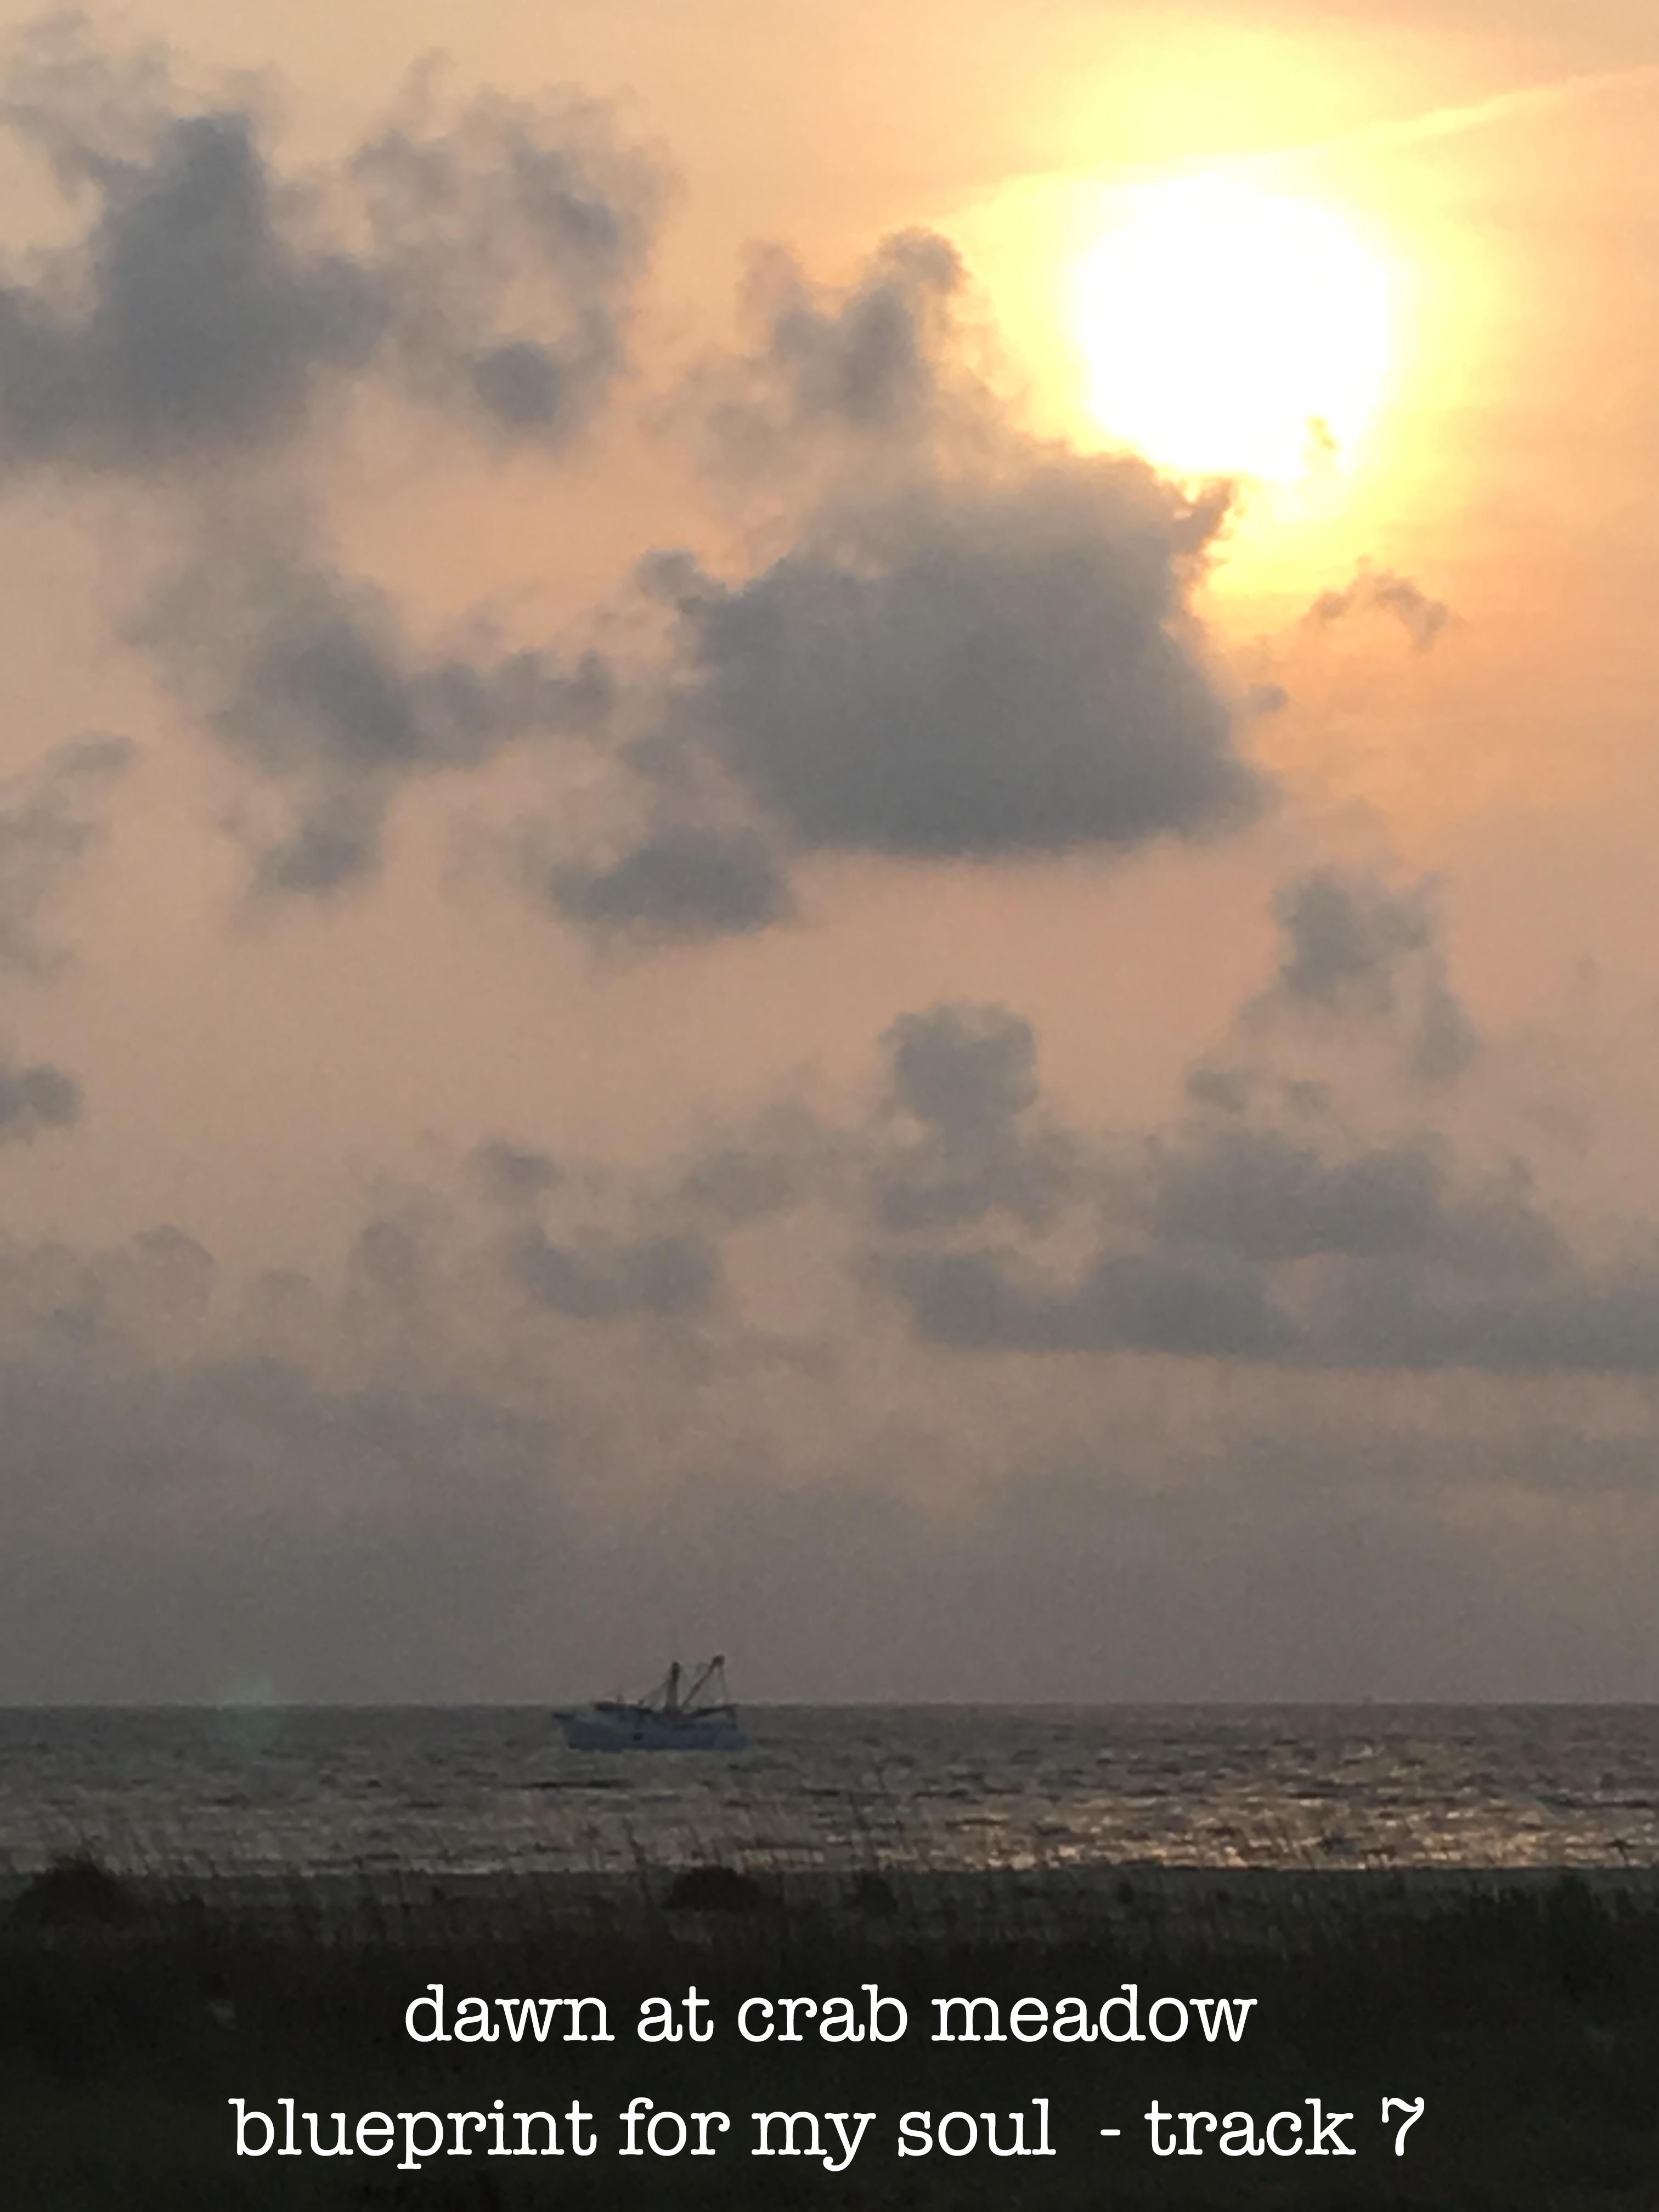 dawn at crab meadow songbox